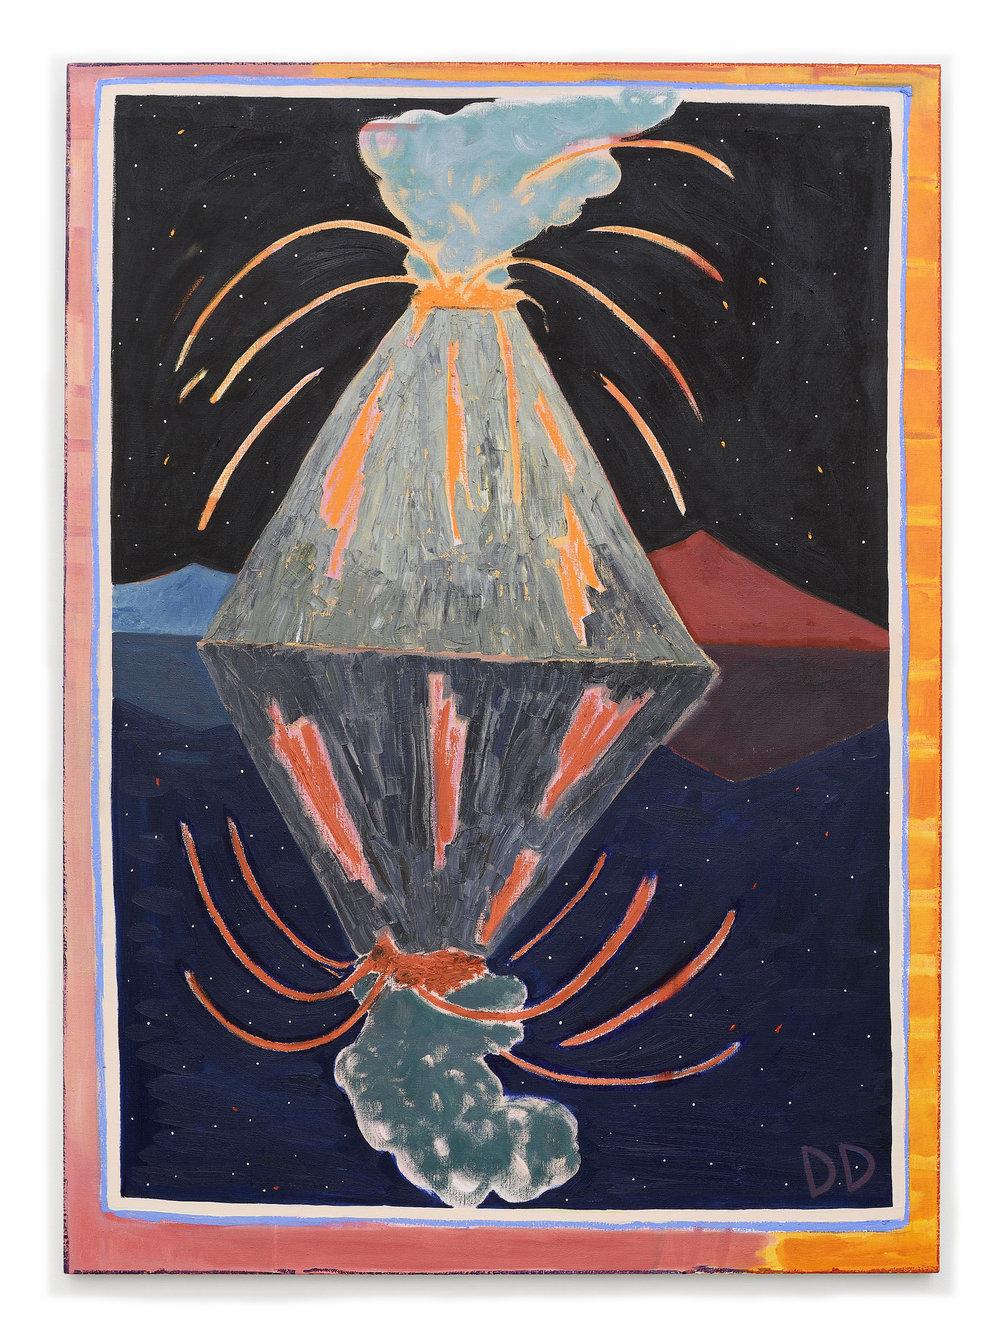 Underwater Cinder Cone  Oil on Flax  130 x 180 cm